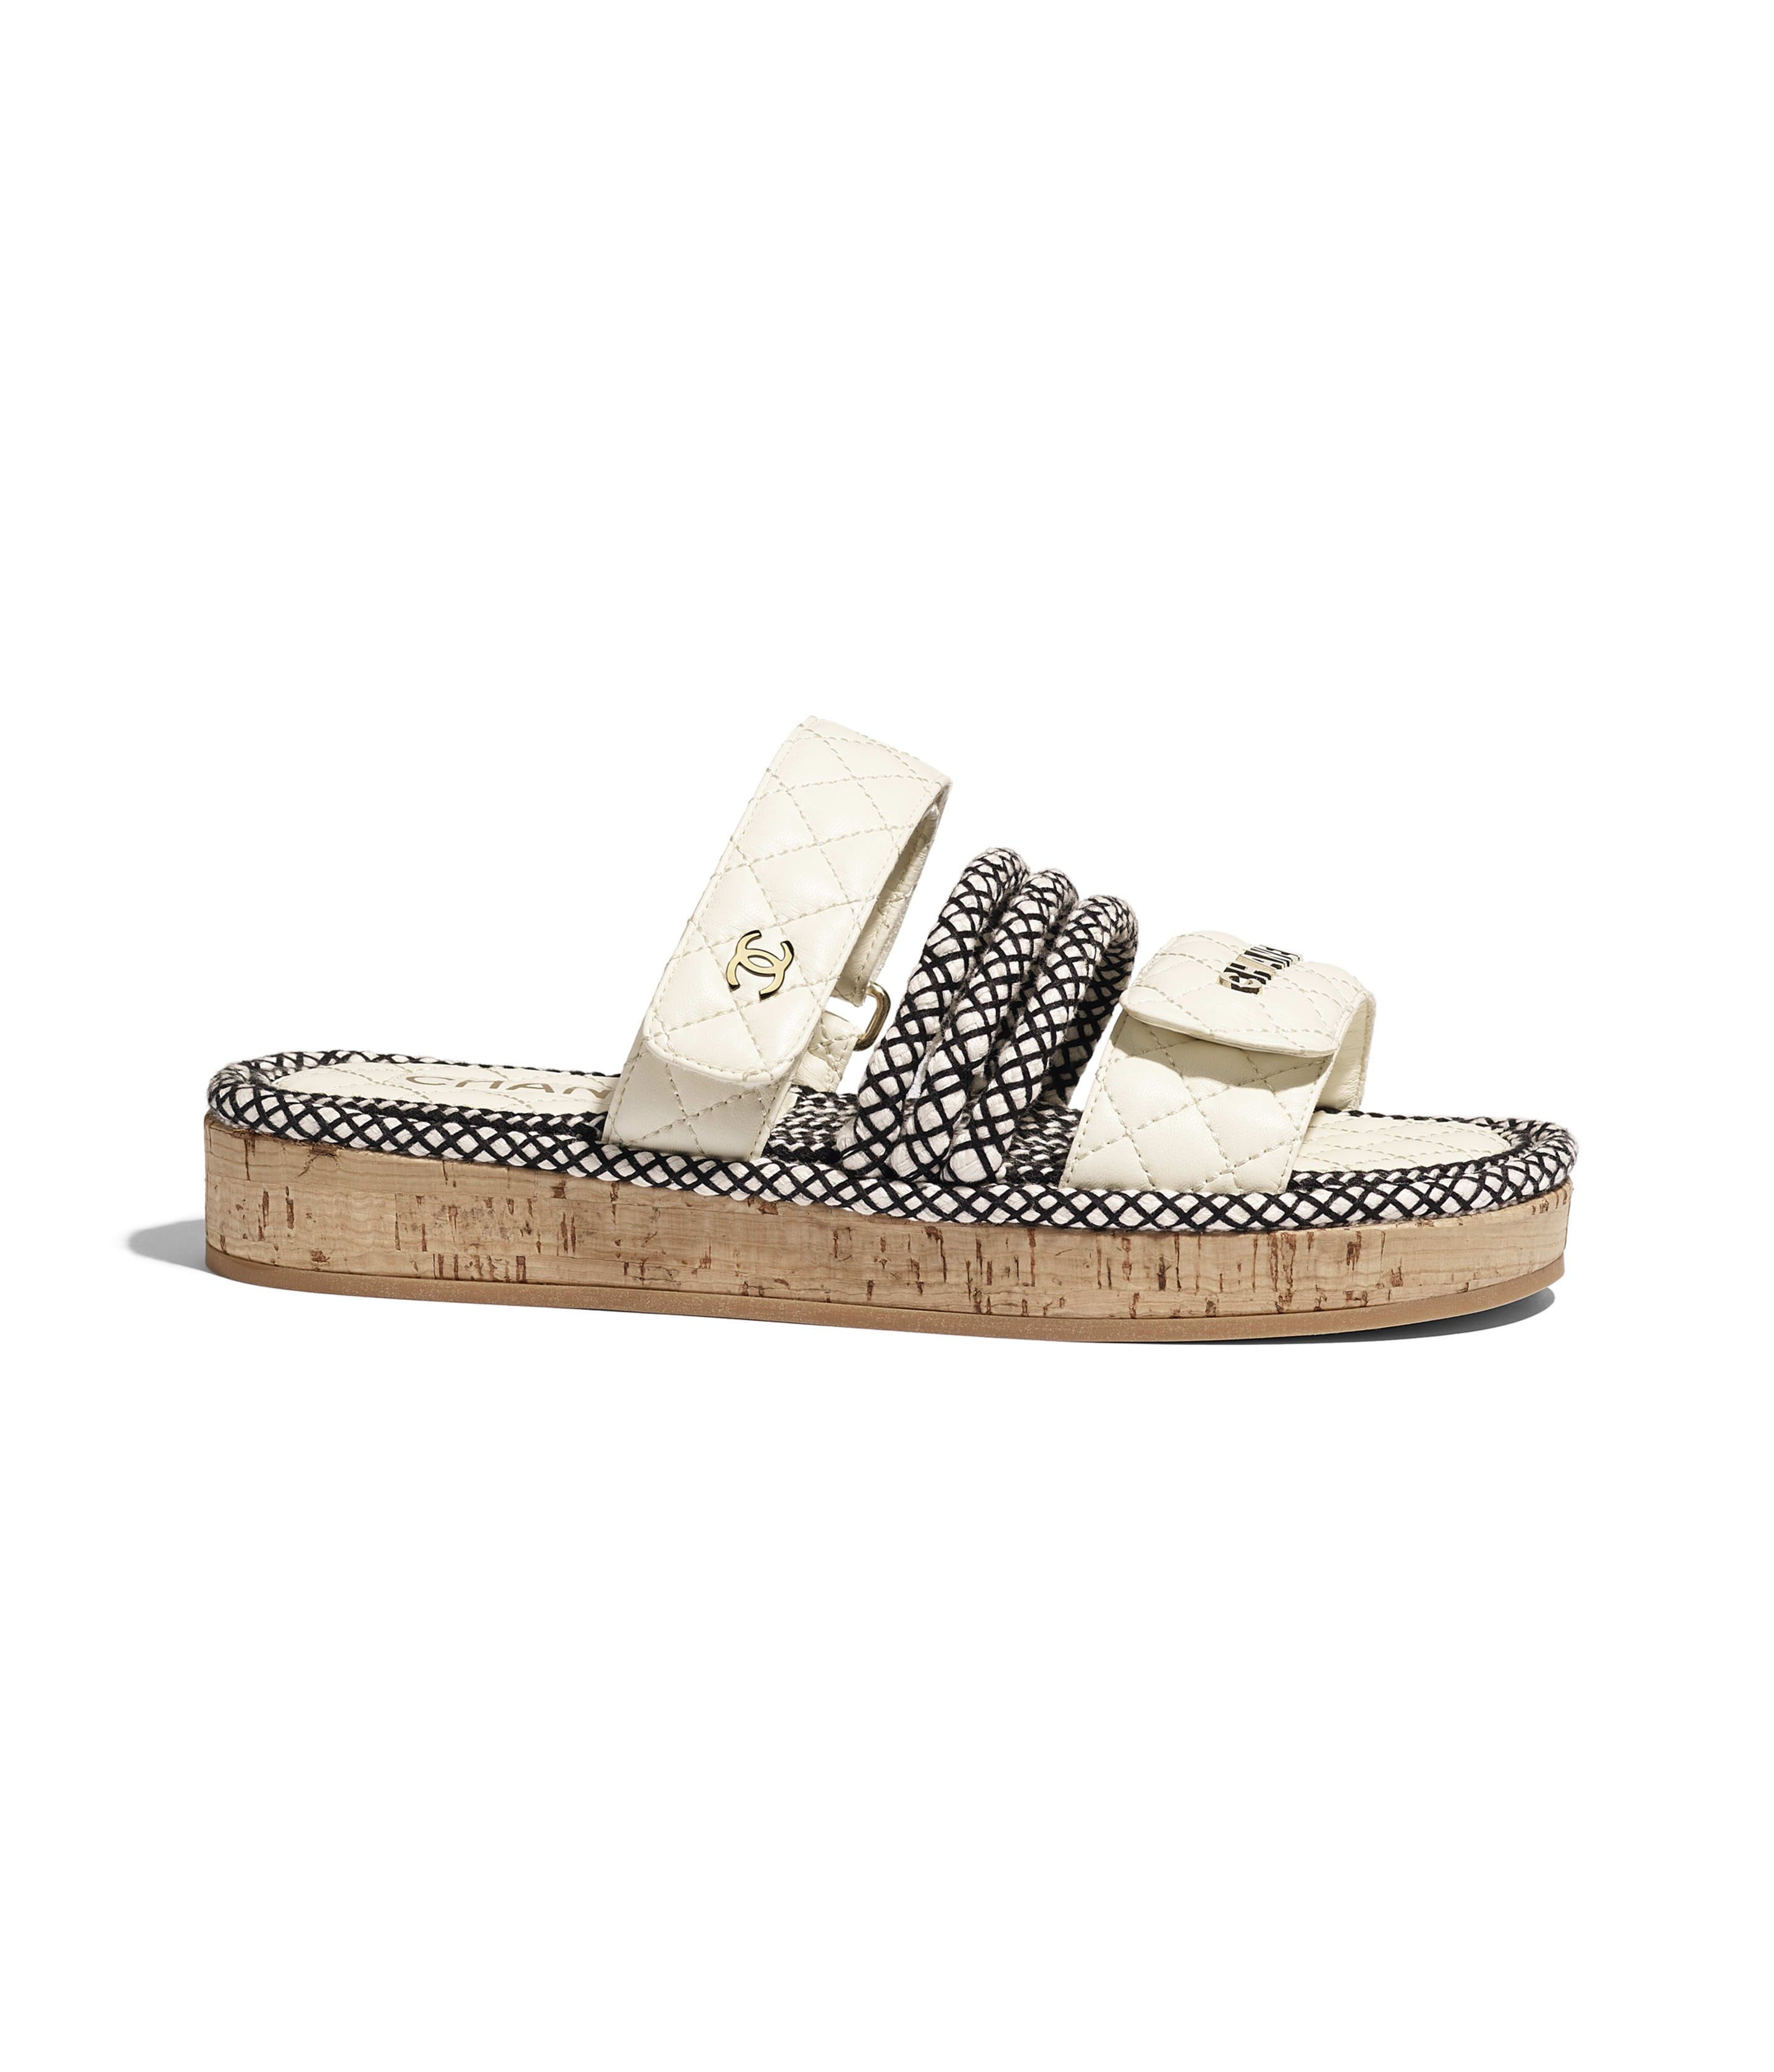 Chanel sandals, Fashion shoes